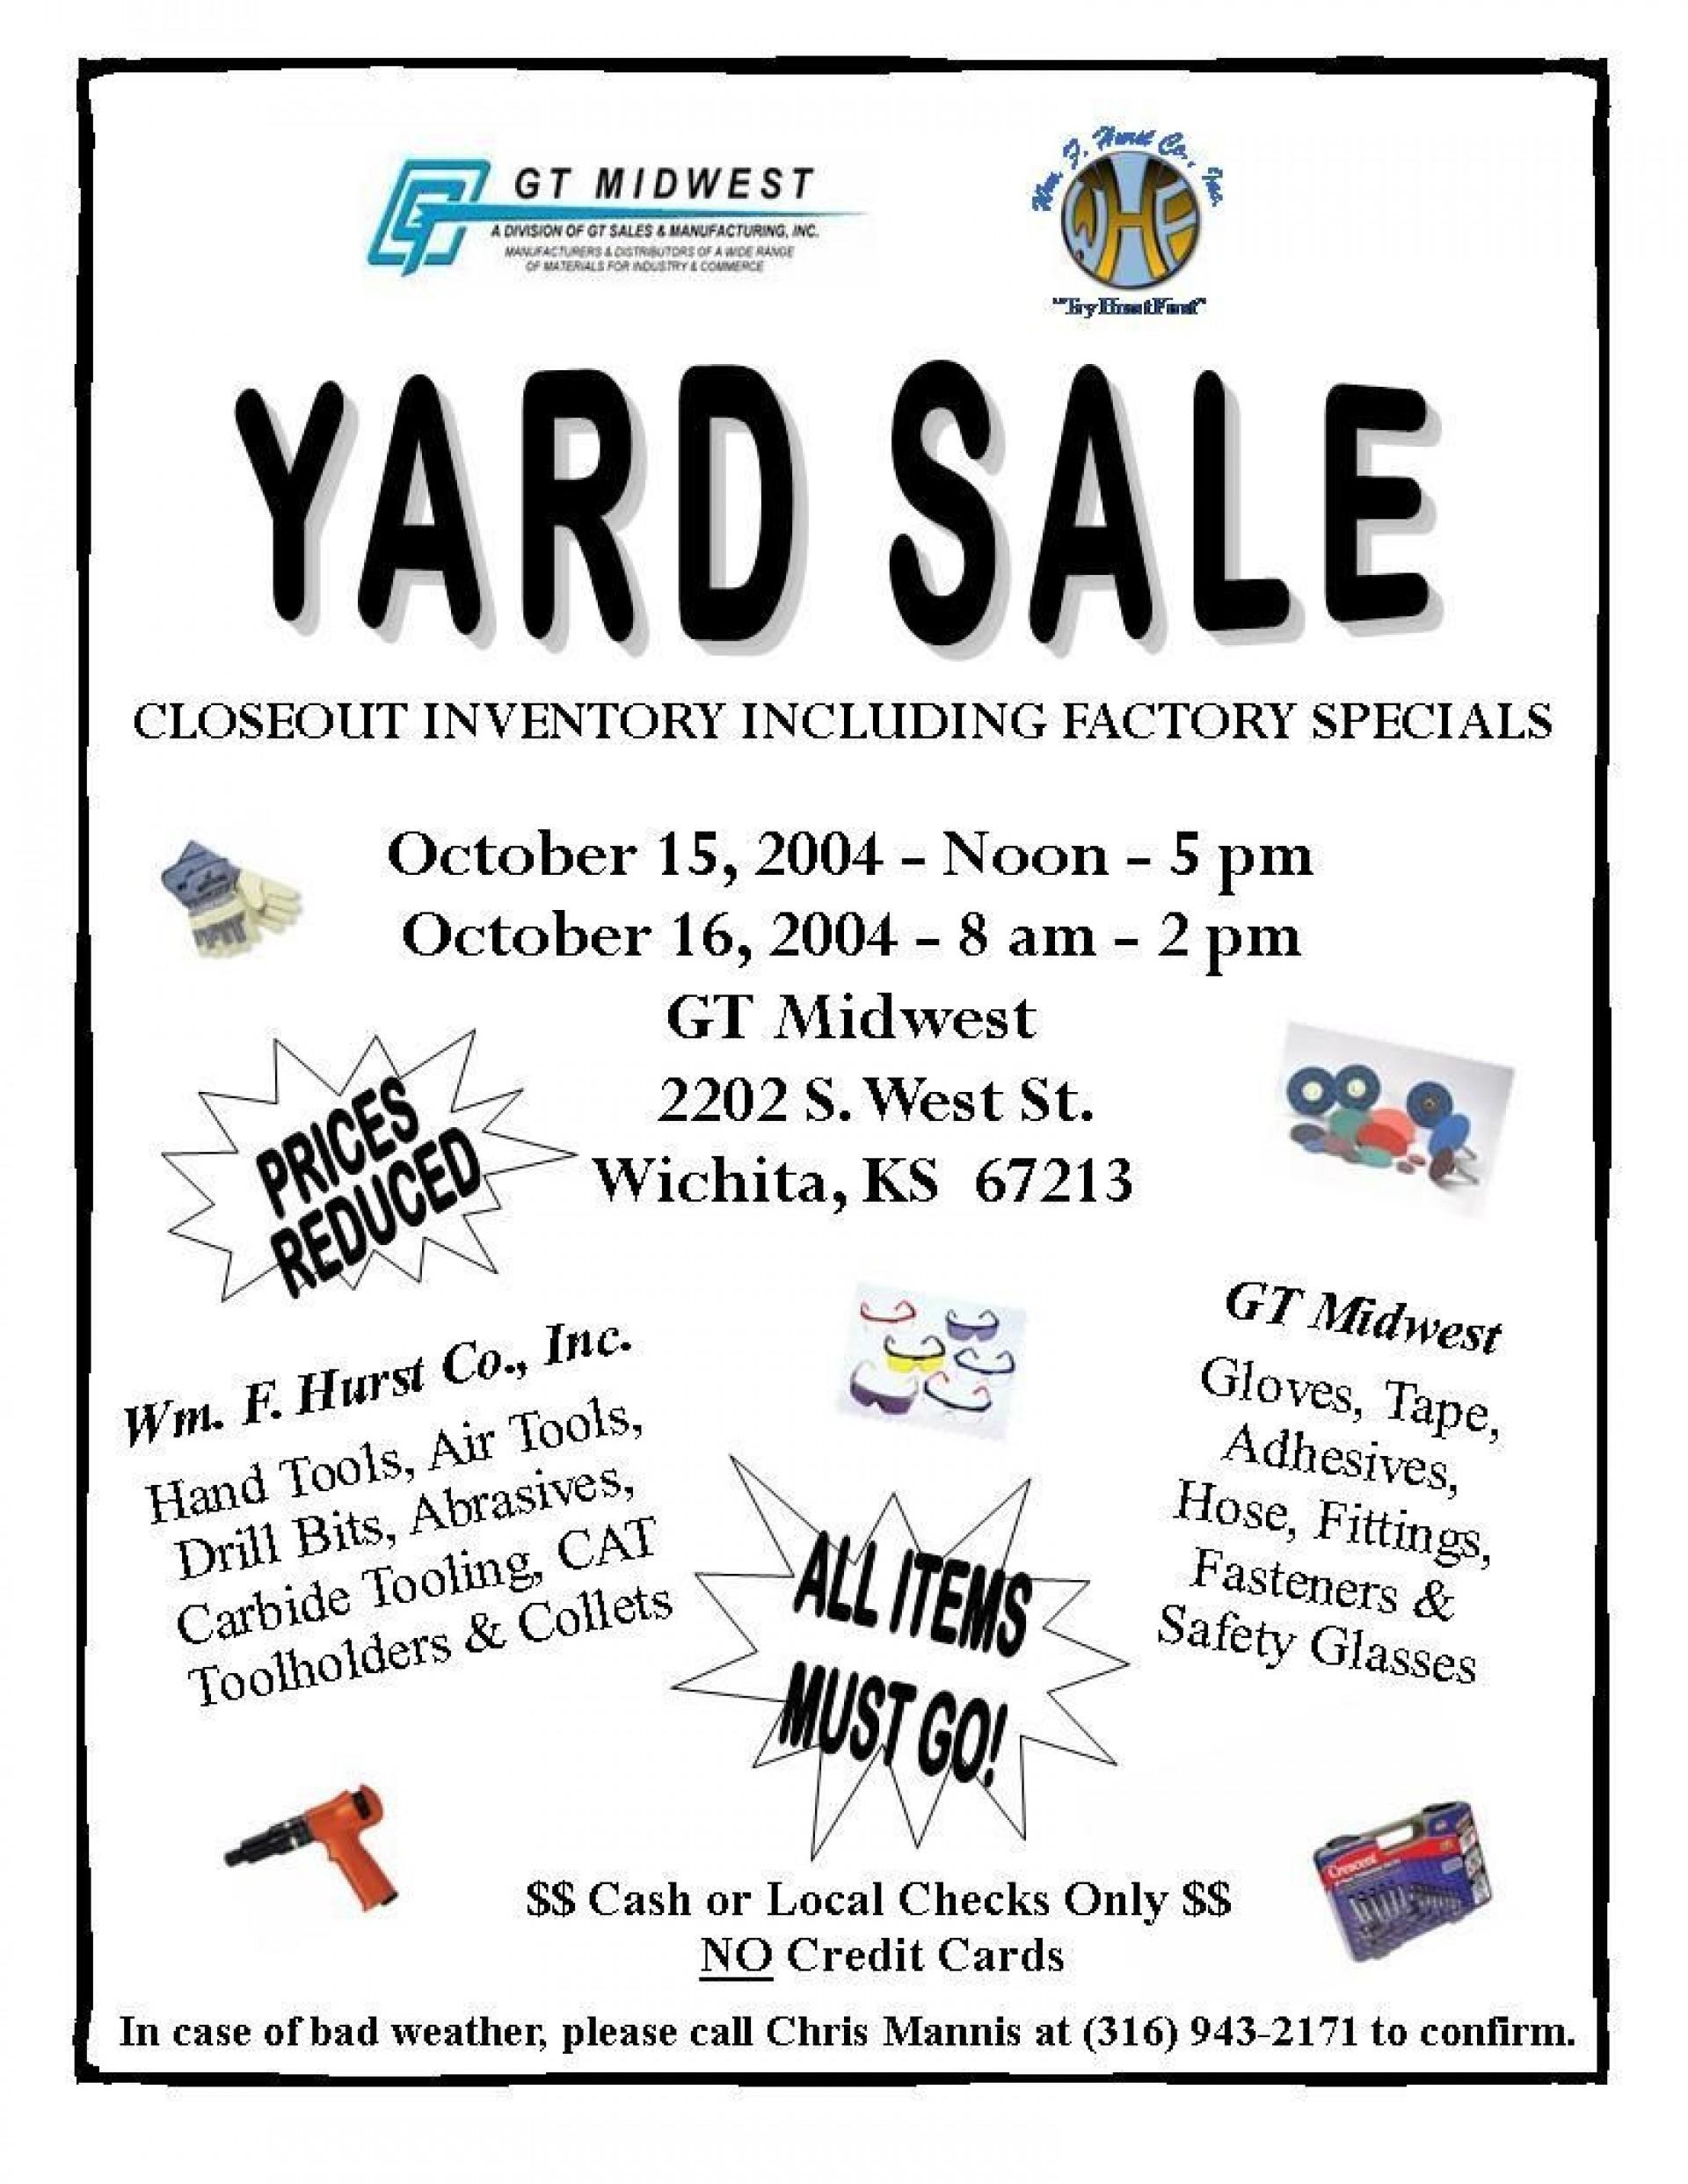 006 Surprising Garage Sale Flyer Template Free Idea  Community Neighborhood Yard1920